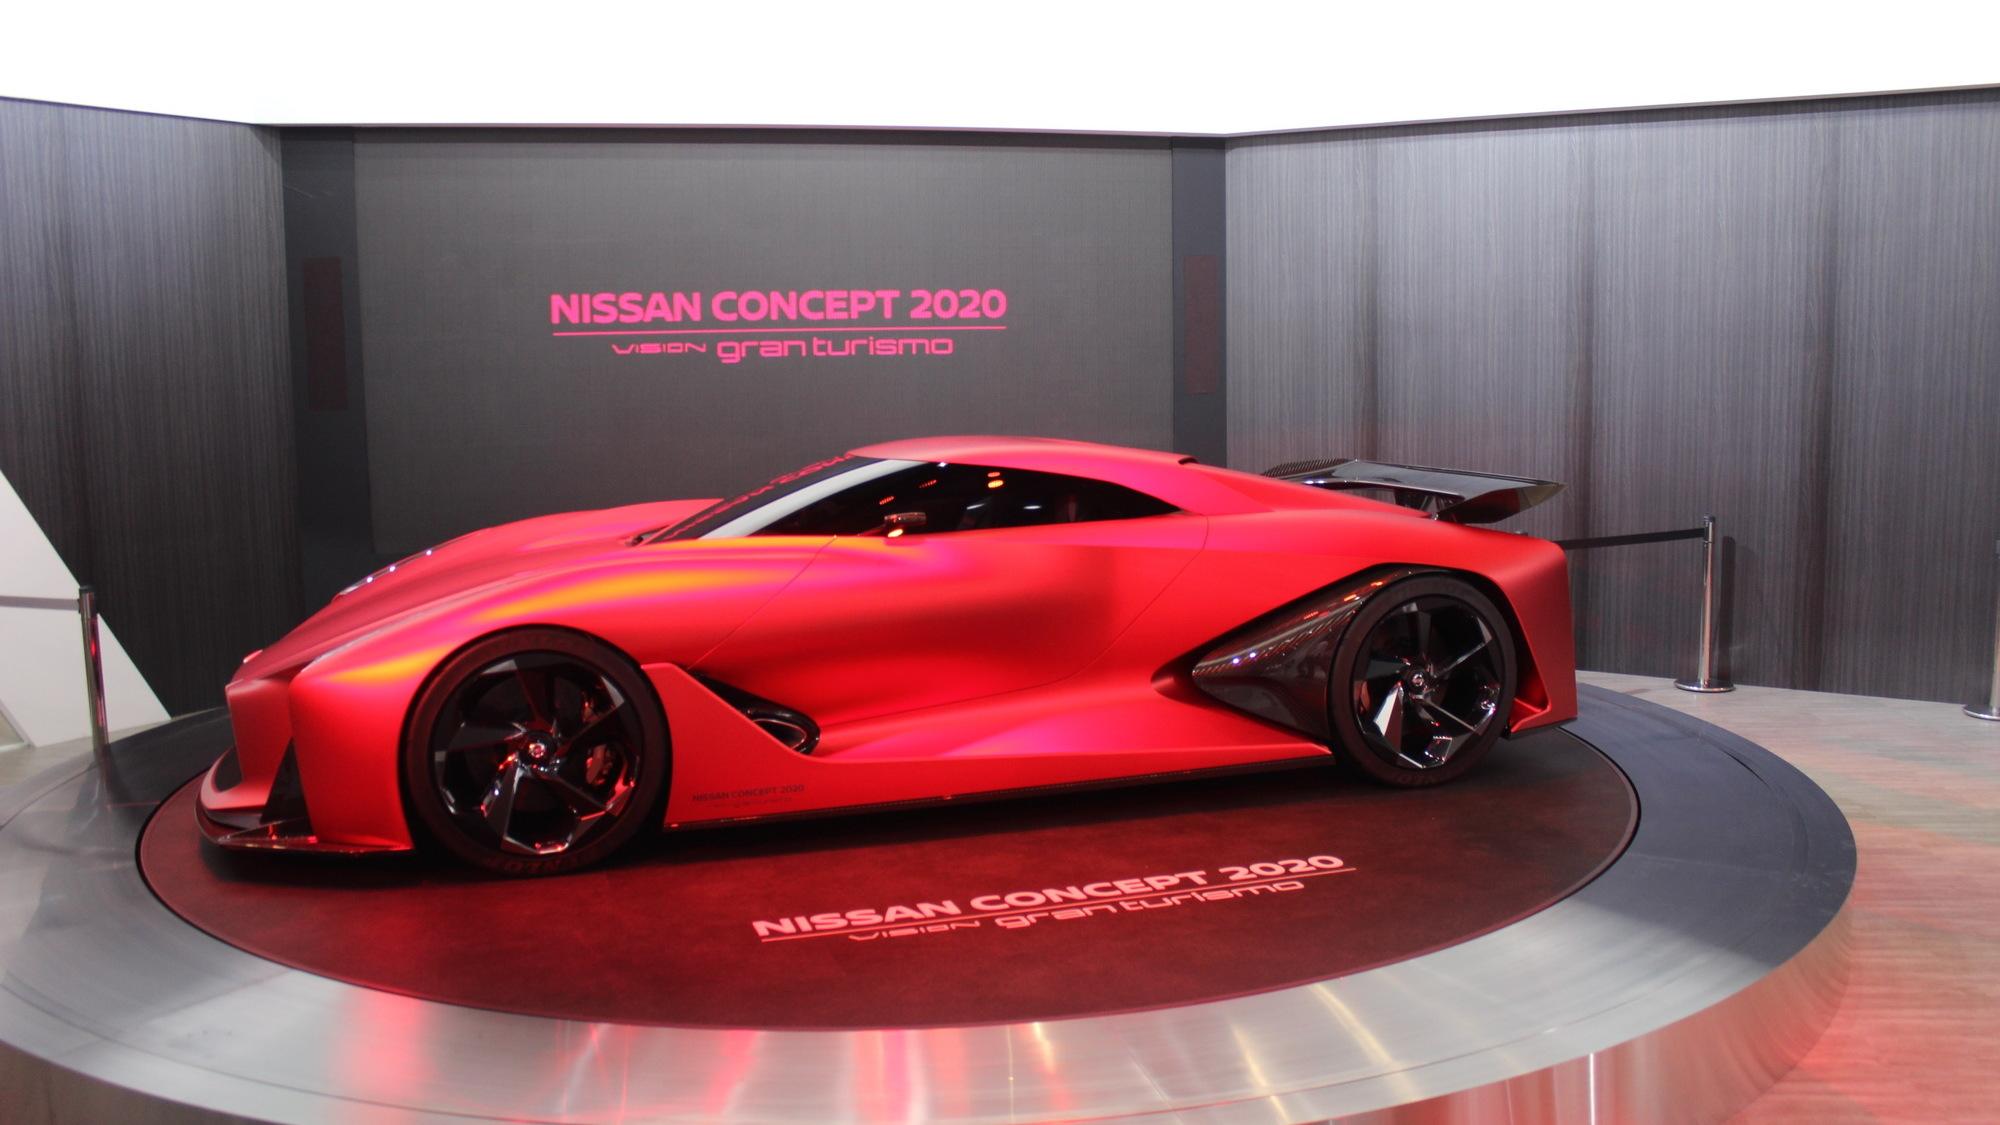 Nissan Concept 2020 Vision Gran Turimso, 2015 Tokyo Motor Show